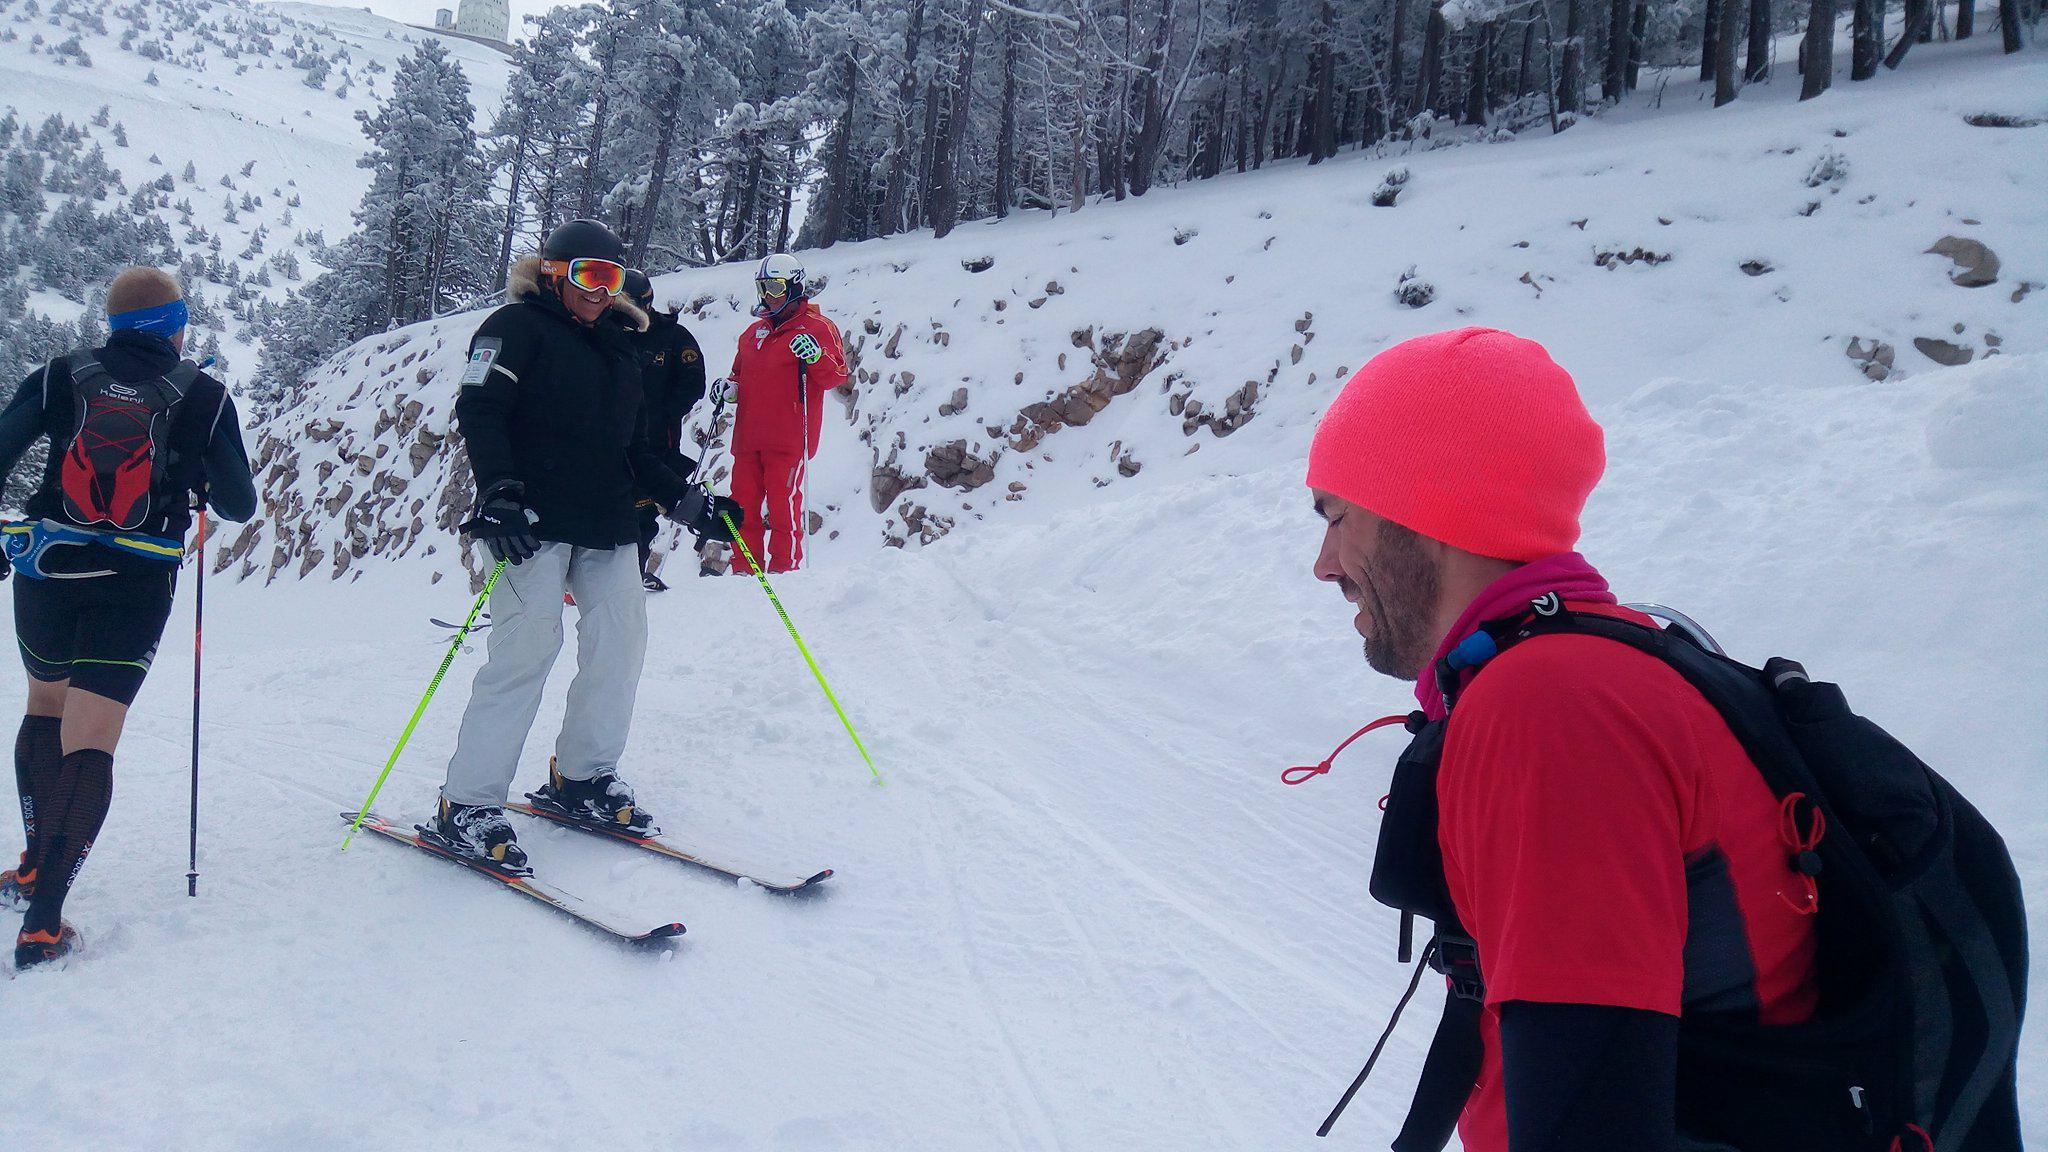 13-Hallucinant: on croise des ..skieurs!